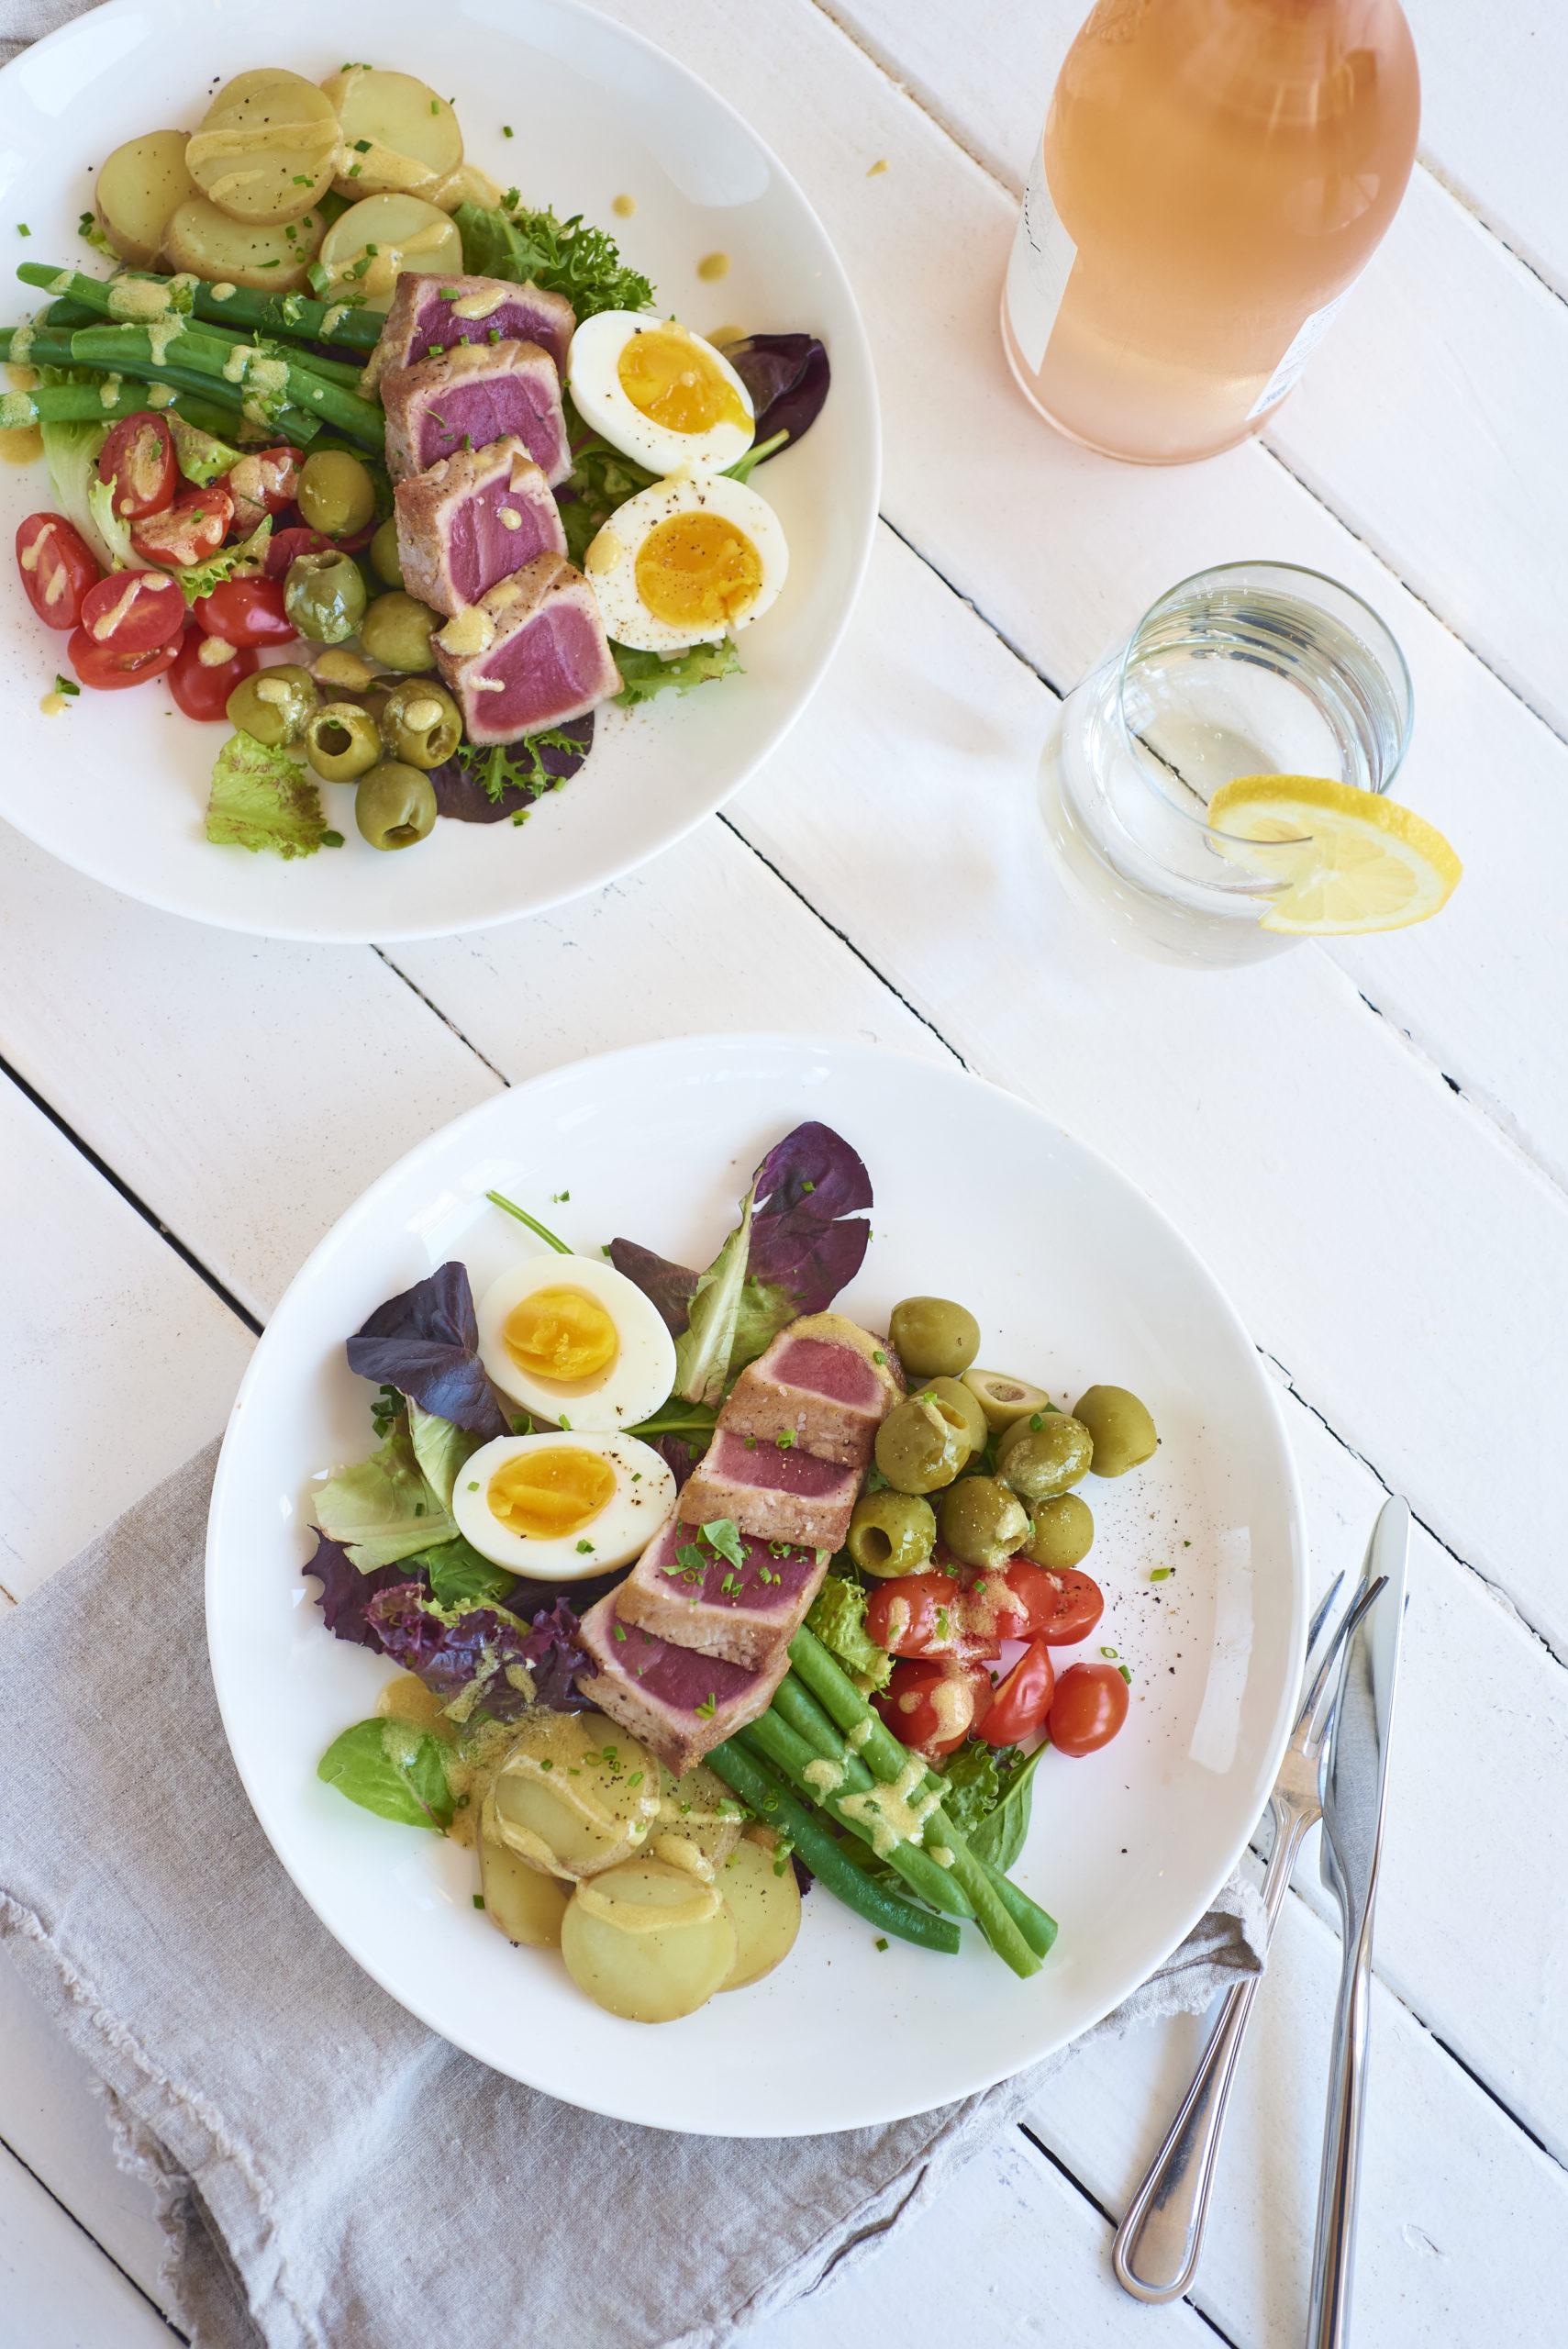 Salad nicoise at La Fin Kitchen & Lounge in Montauk.